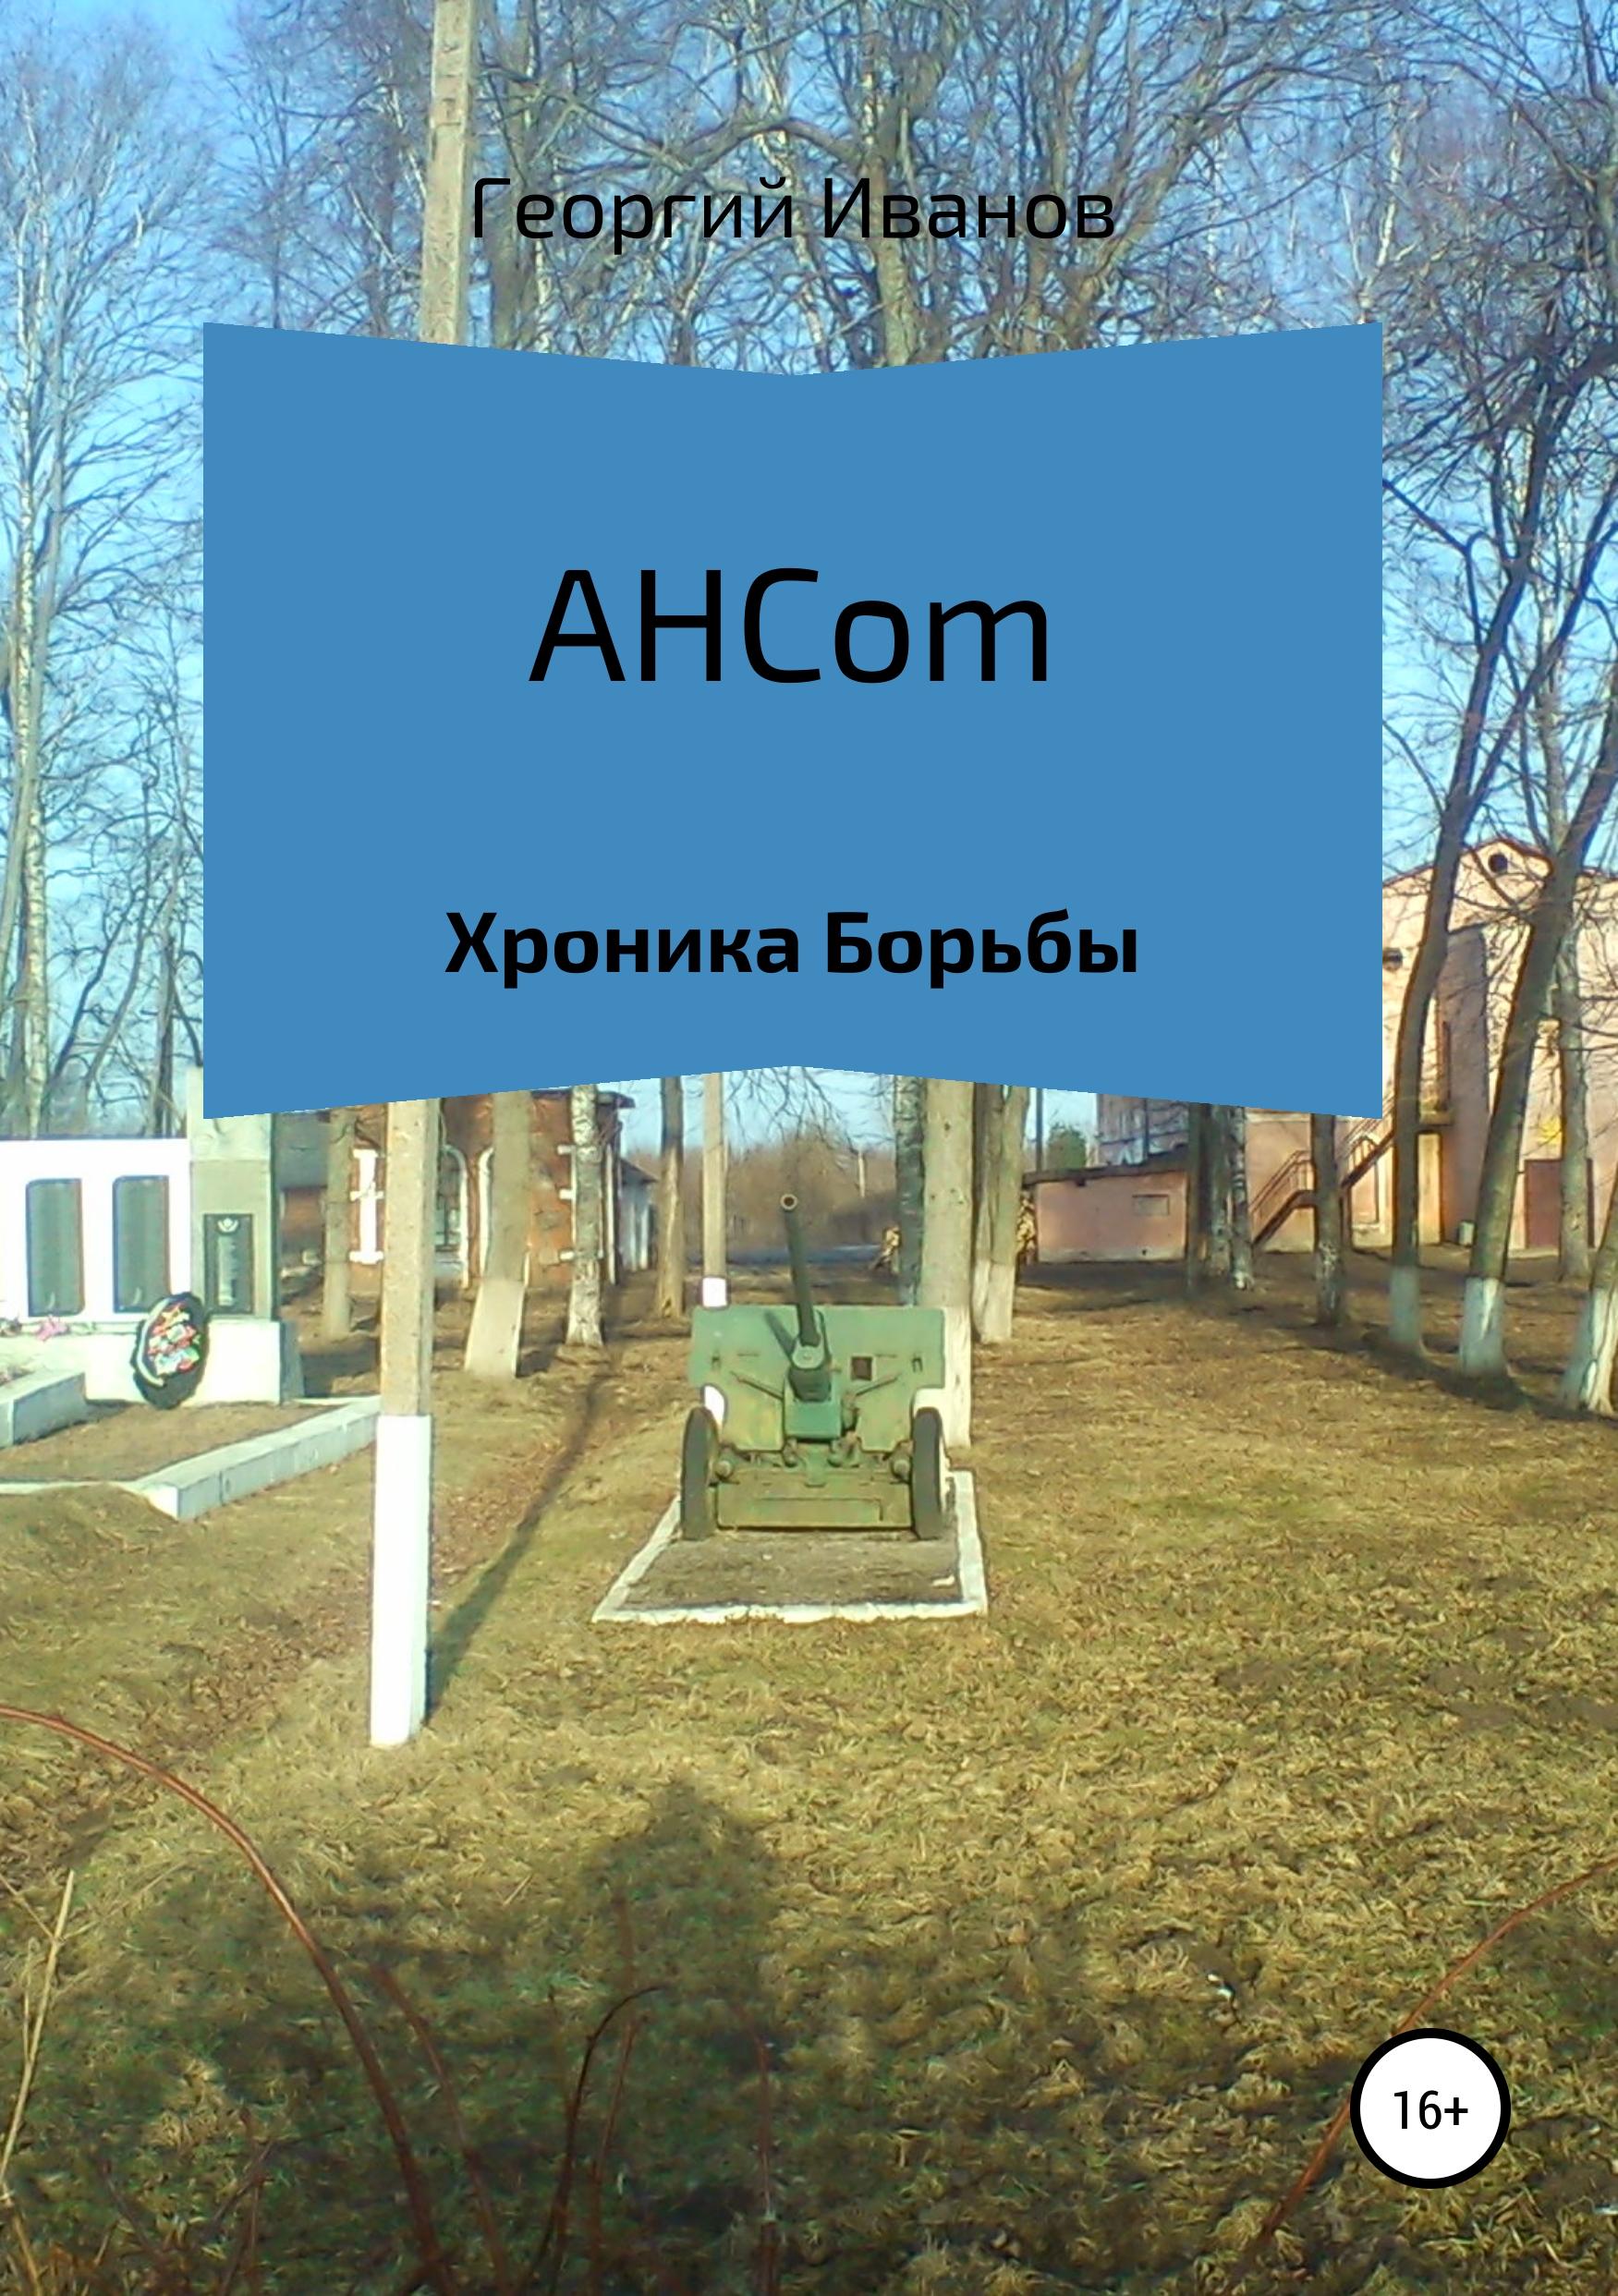 AHCom. Хроника борьбы